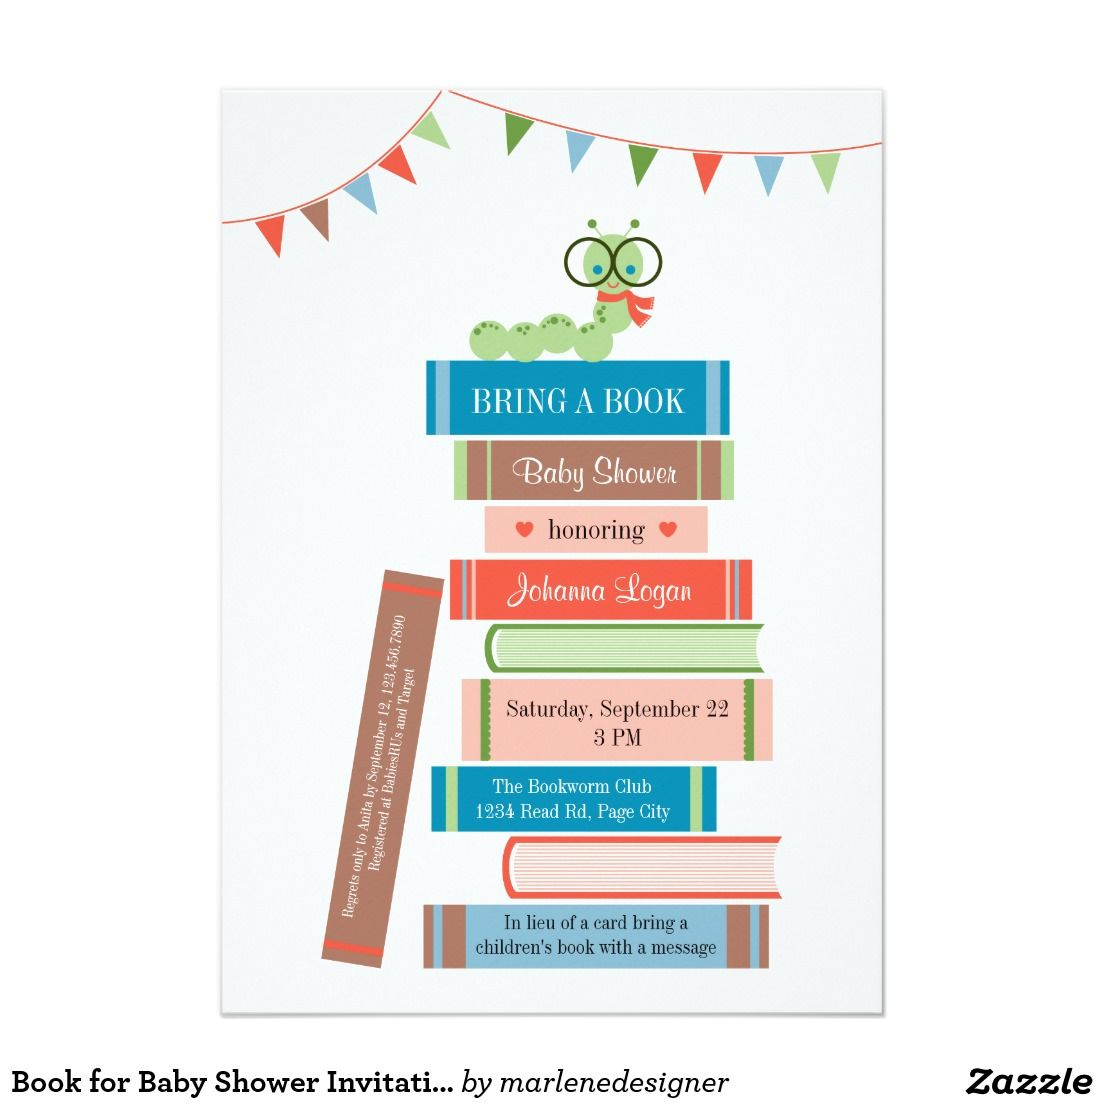 Book for Baby Shower Invitation | Pinterest | Shower invitations ...